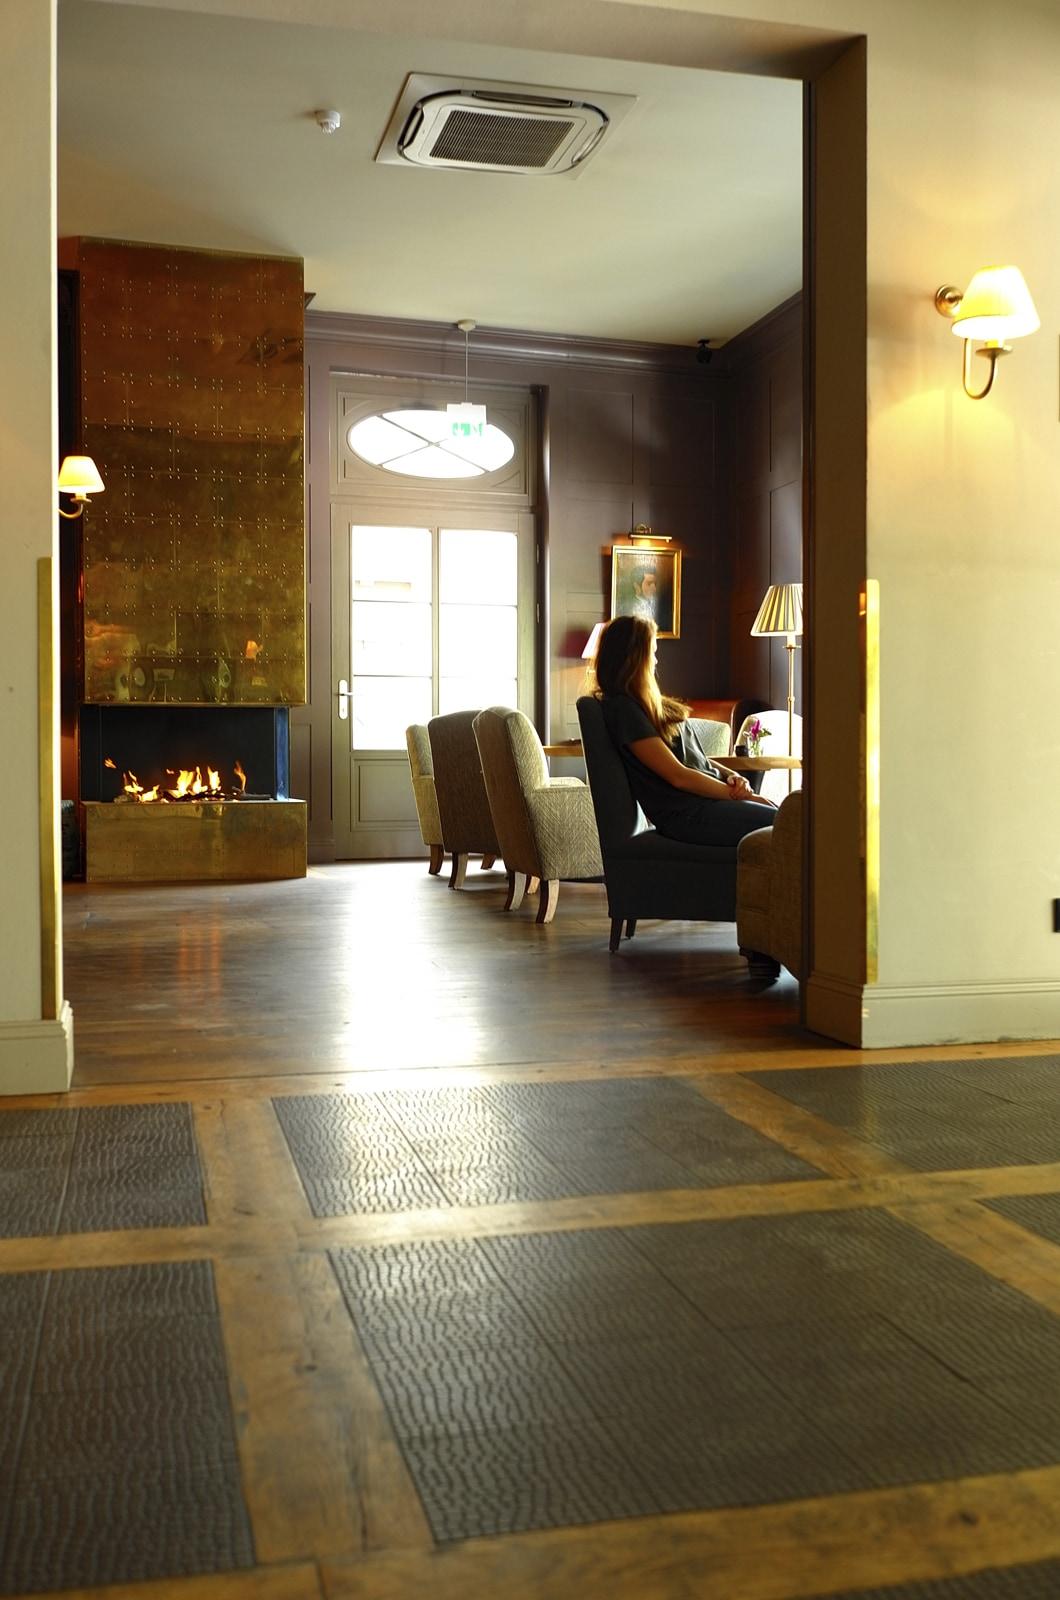 zementfliesen-VIA_zementmosaikplatten-nr.40760-hotel-monbijou-03-viaplatten   40760